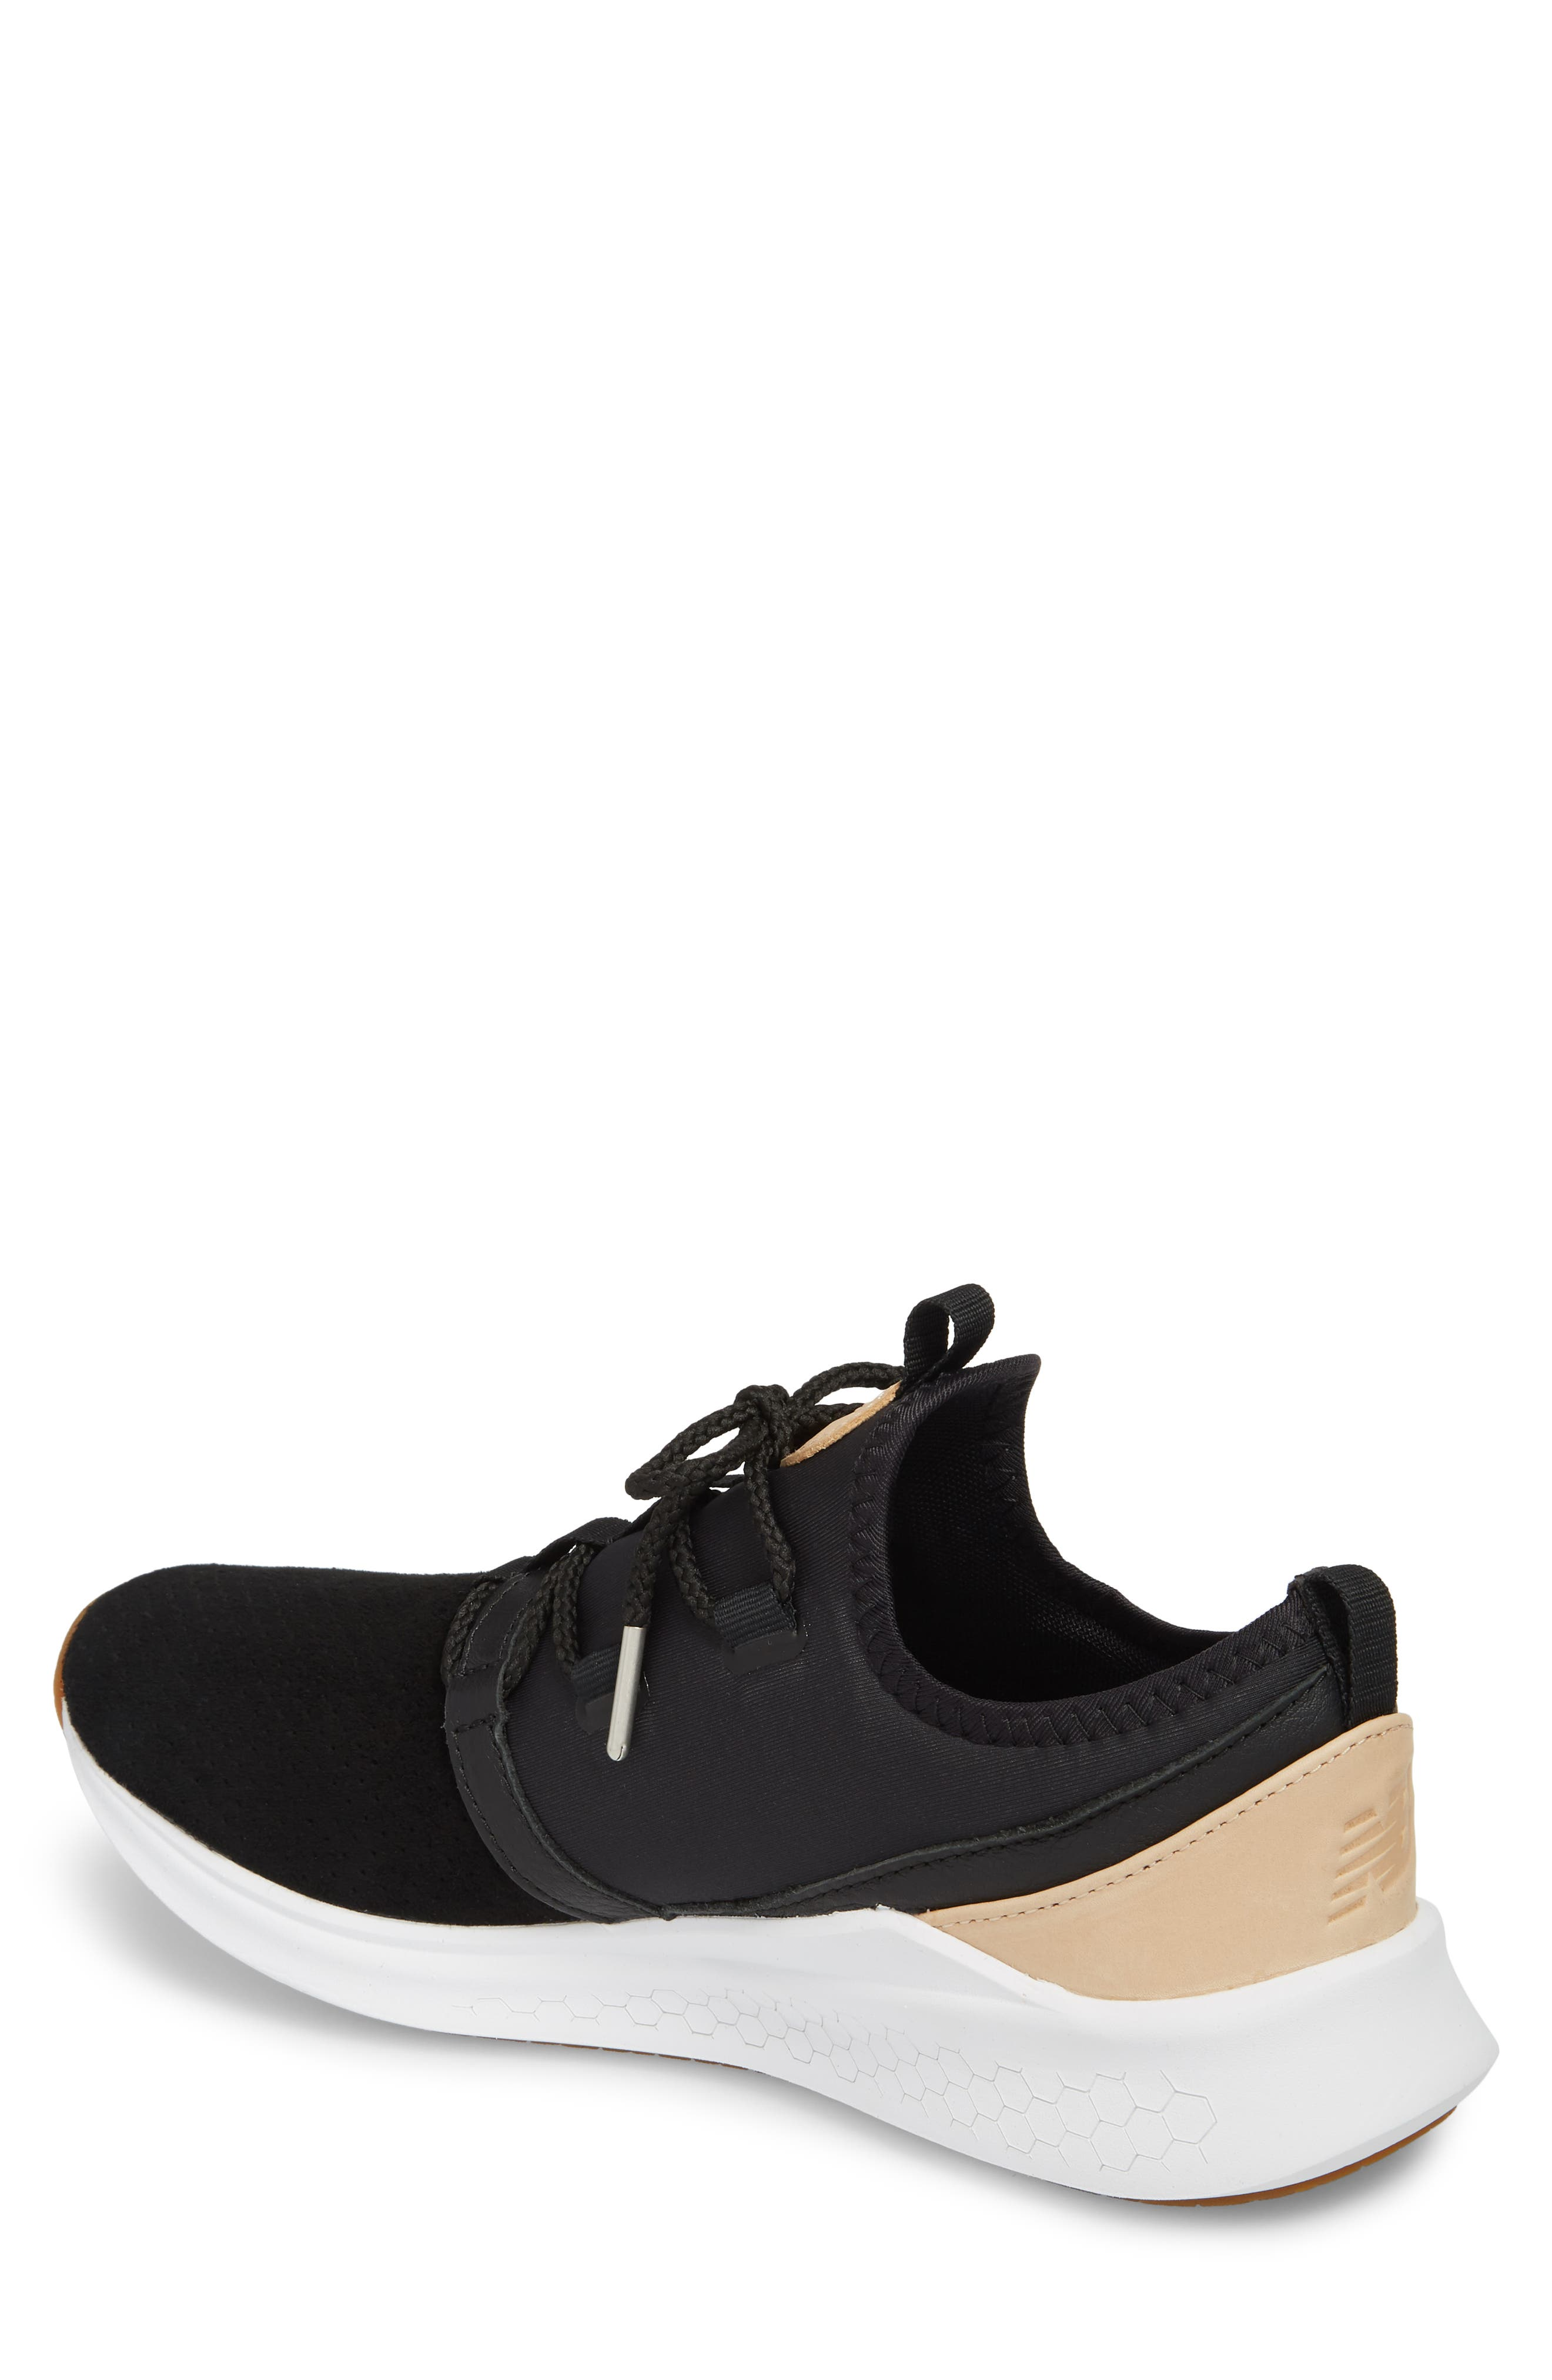 Fresh Foam Lazer Luxe Sneaker,                             Alternate thumbnail 2, color,                             Black